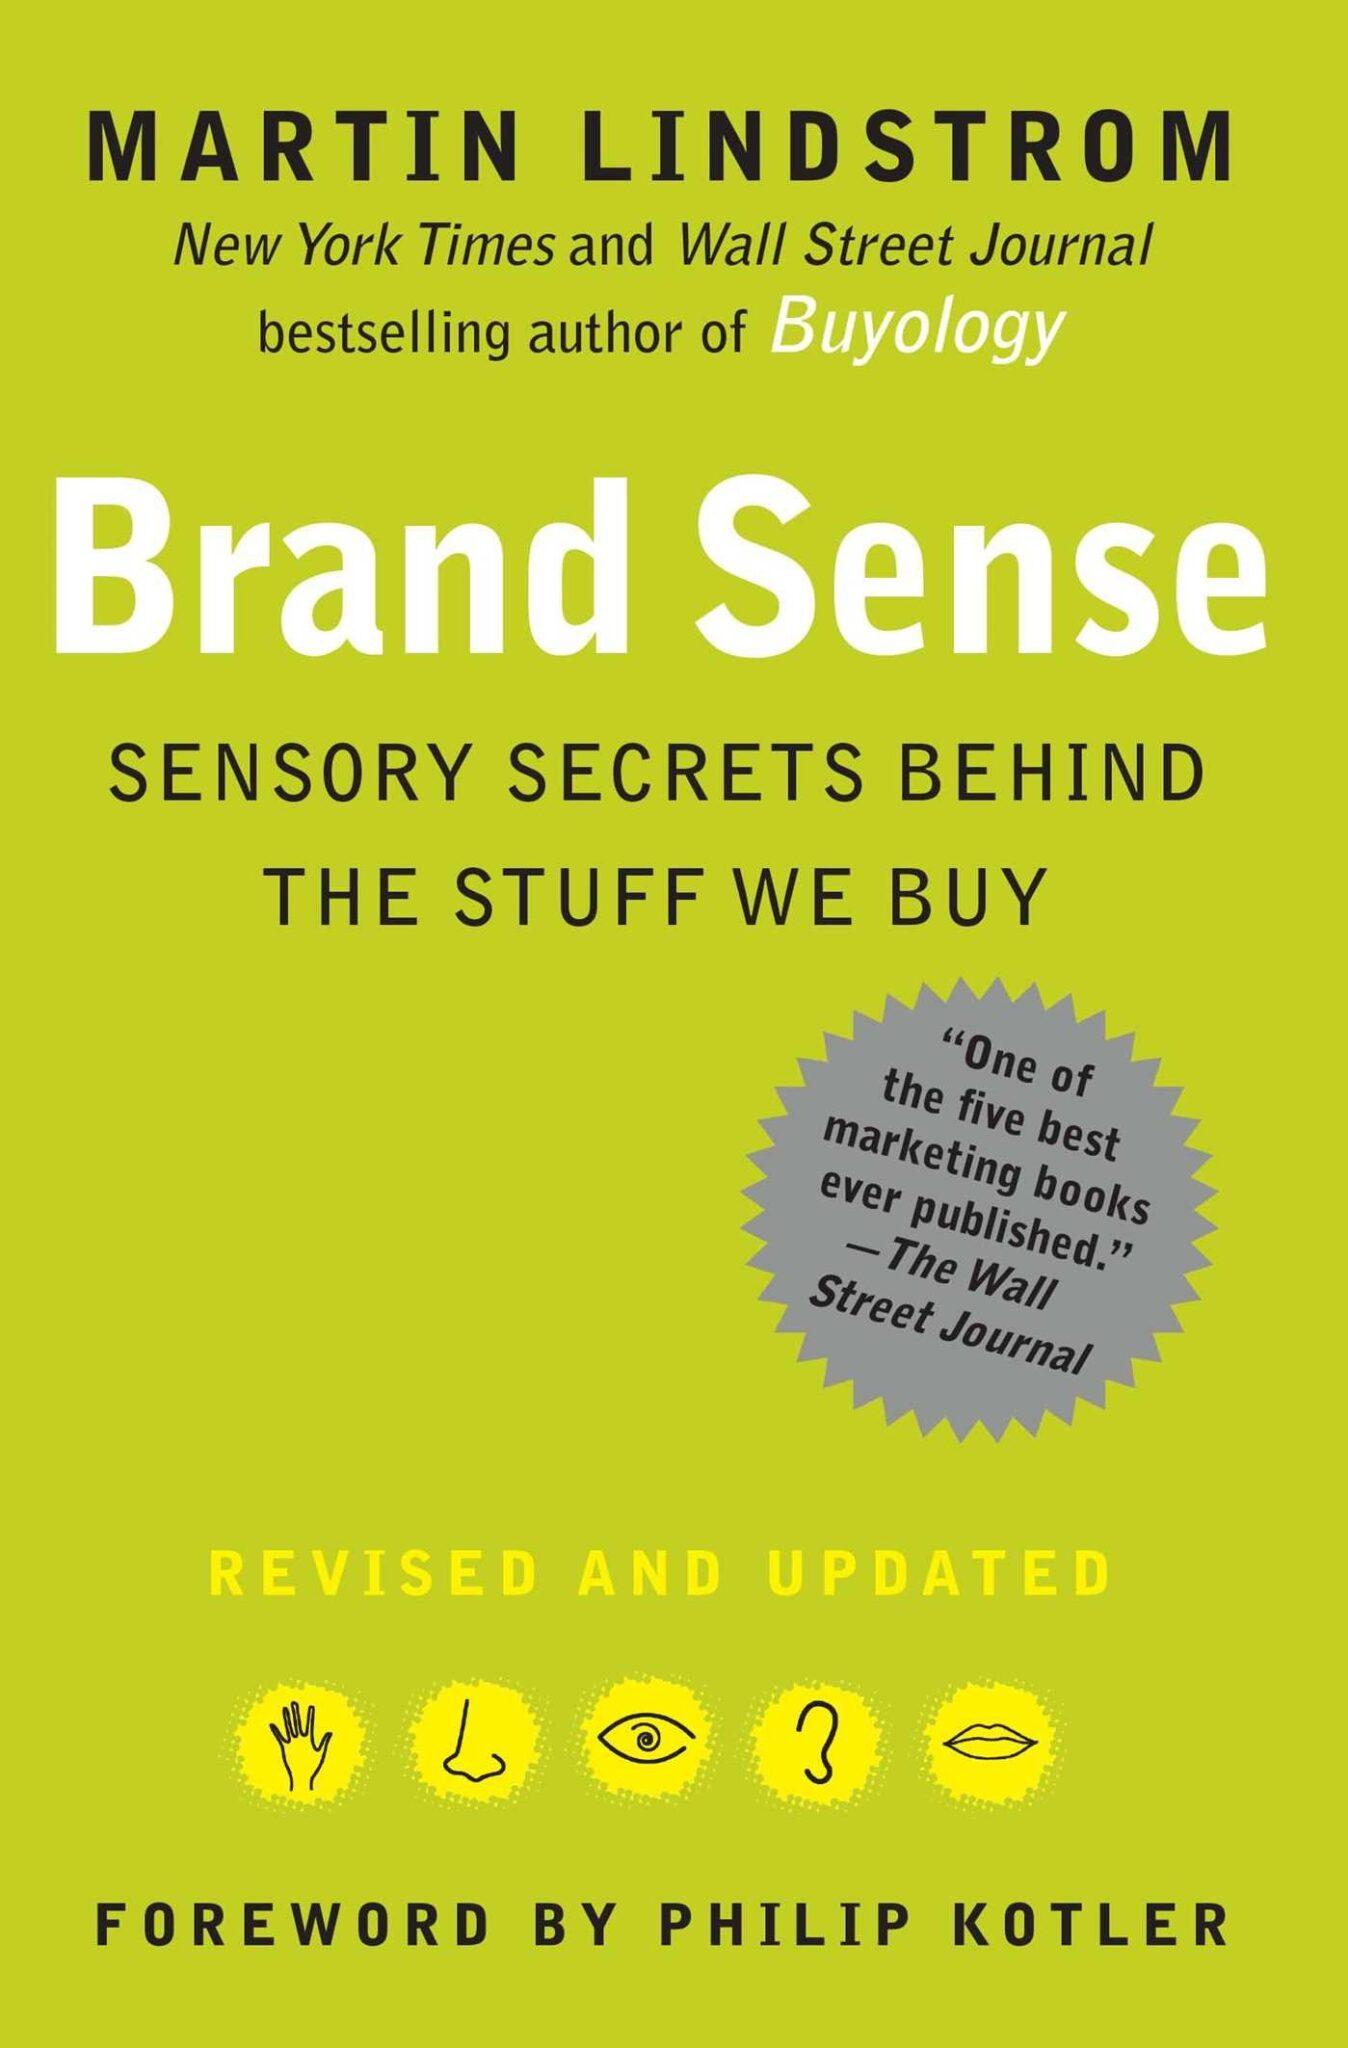 Brand Sense: Sensory Secrets Behind the Stuff We Buy.